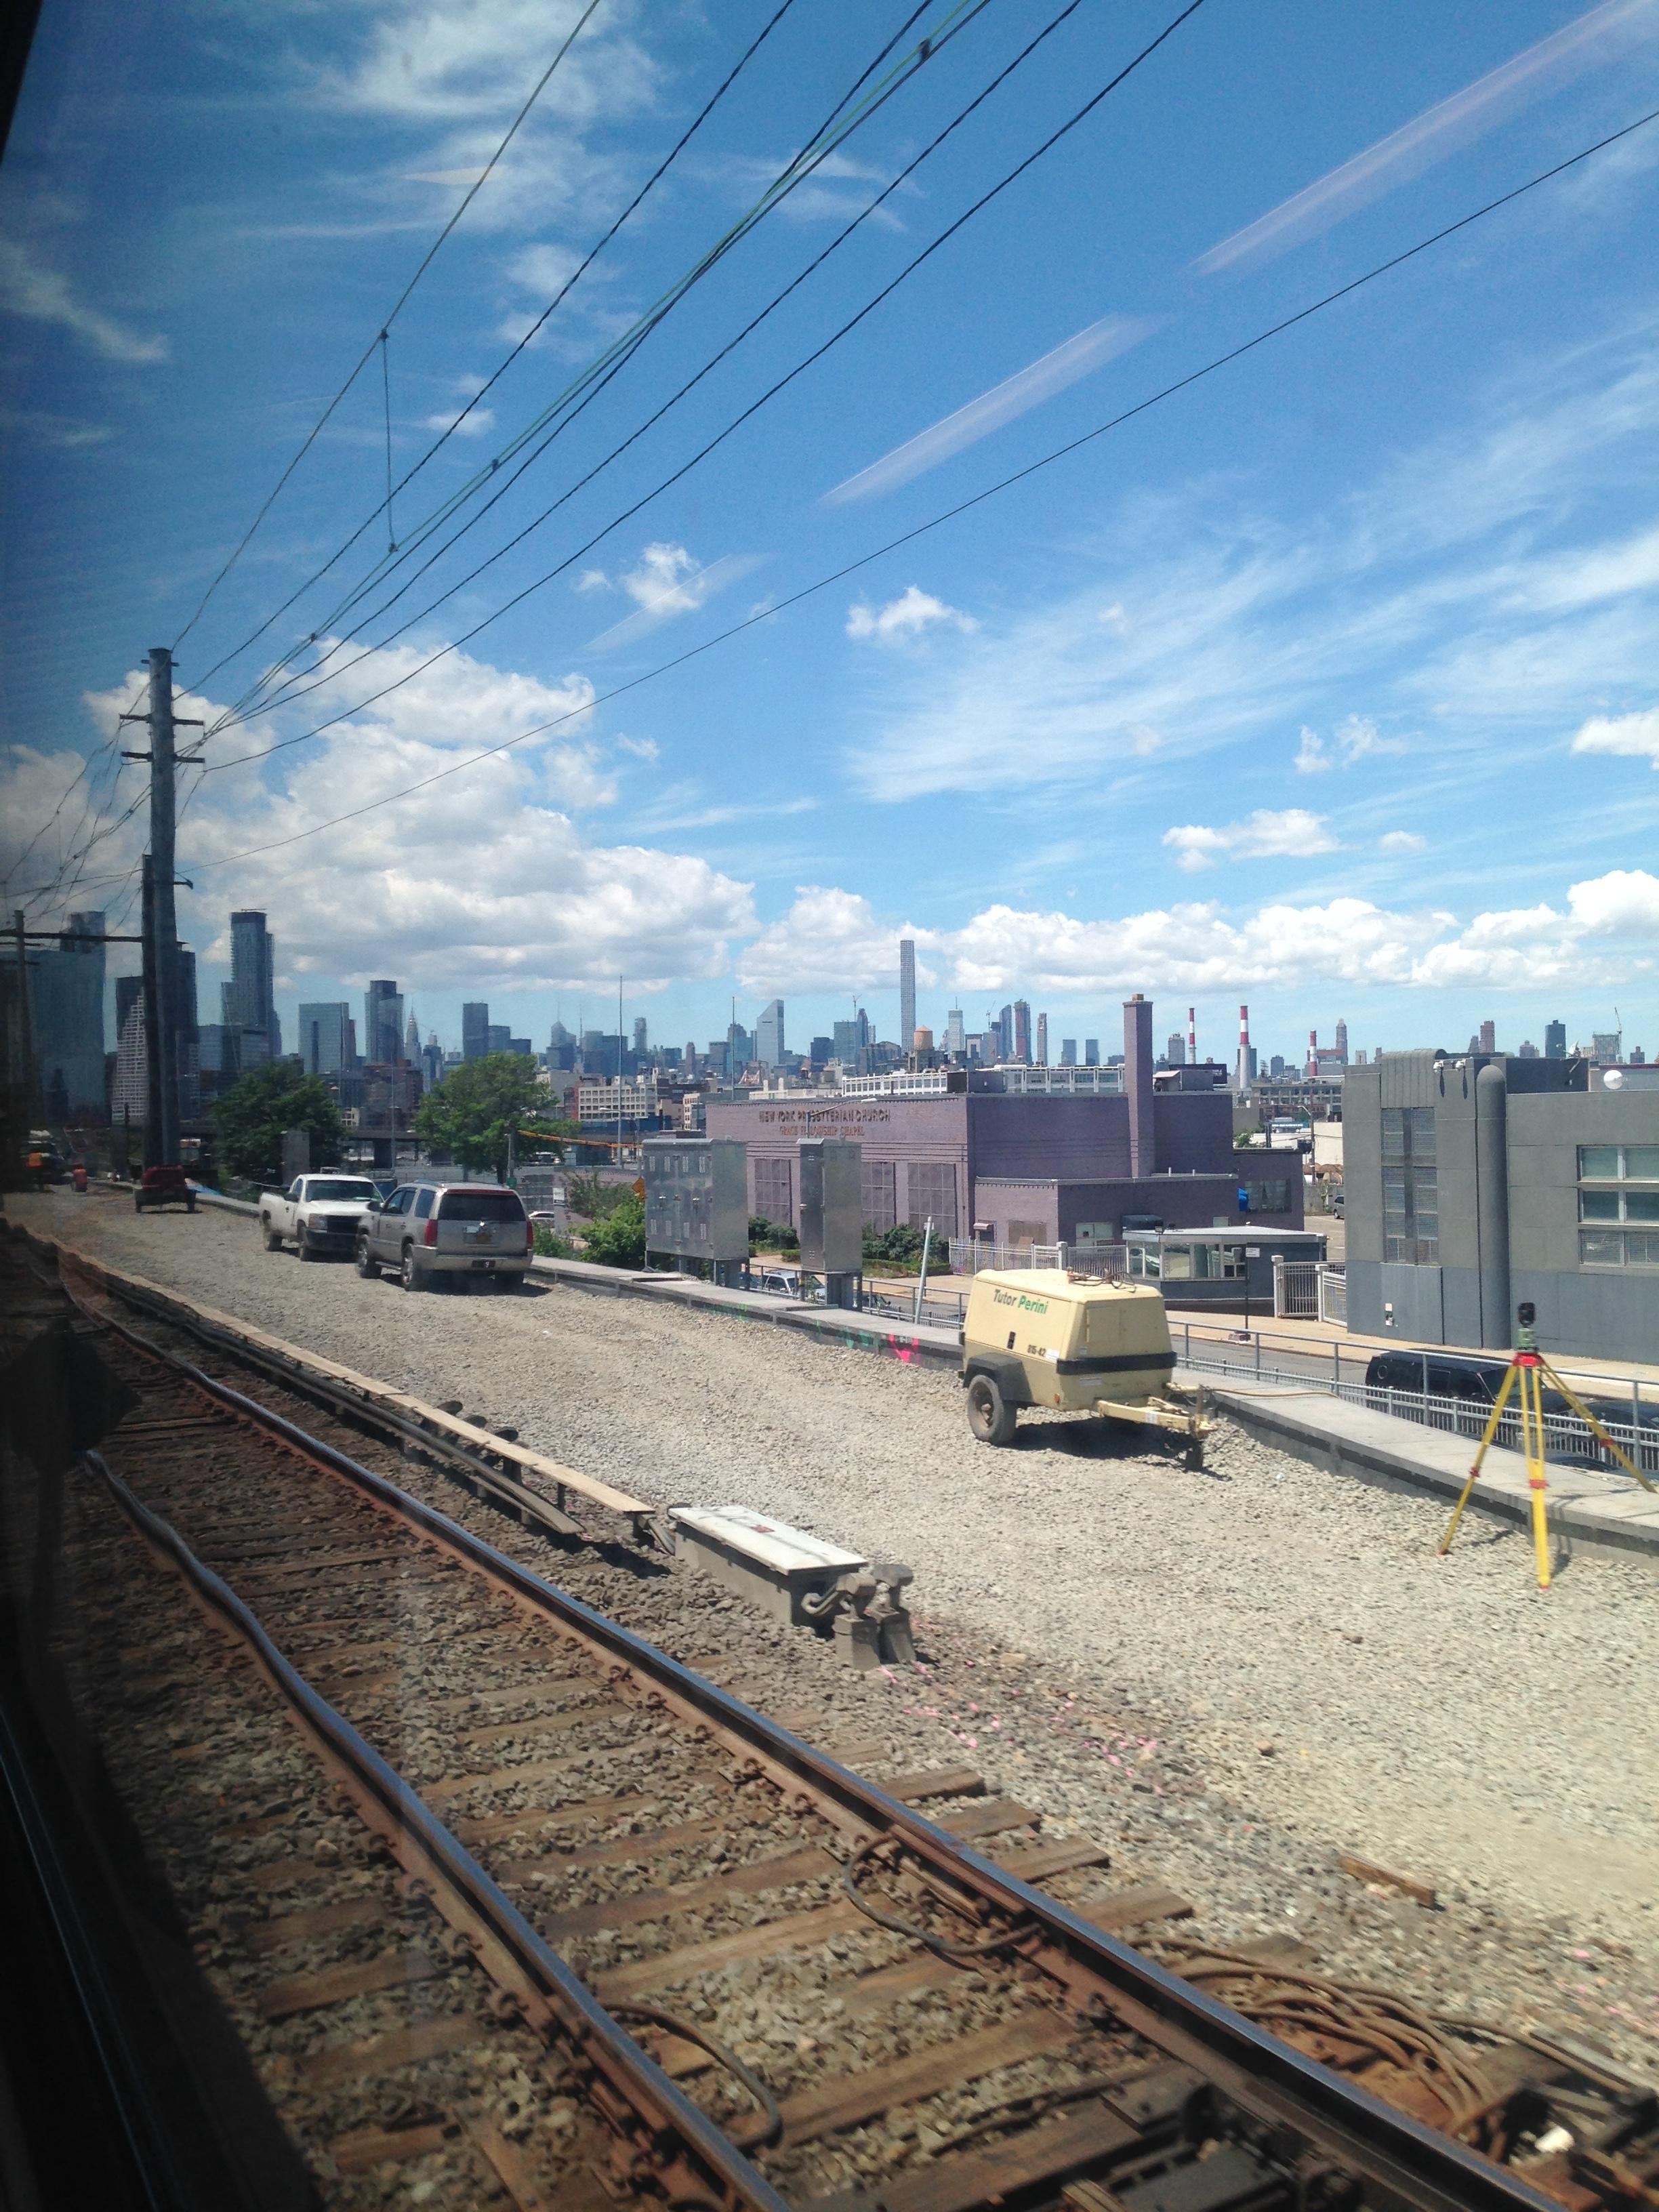 ^ Long Island Train to Penn Stn